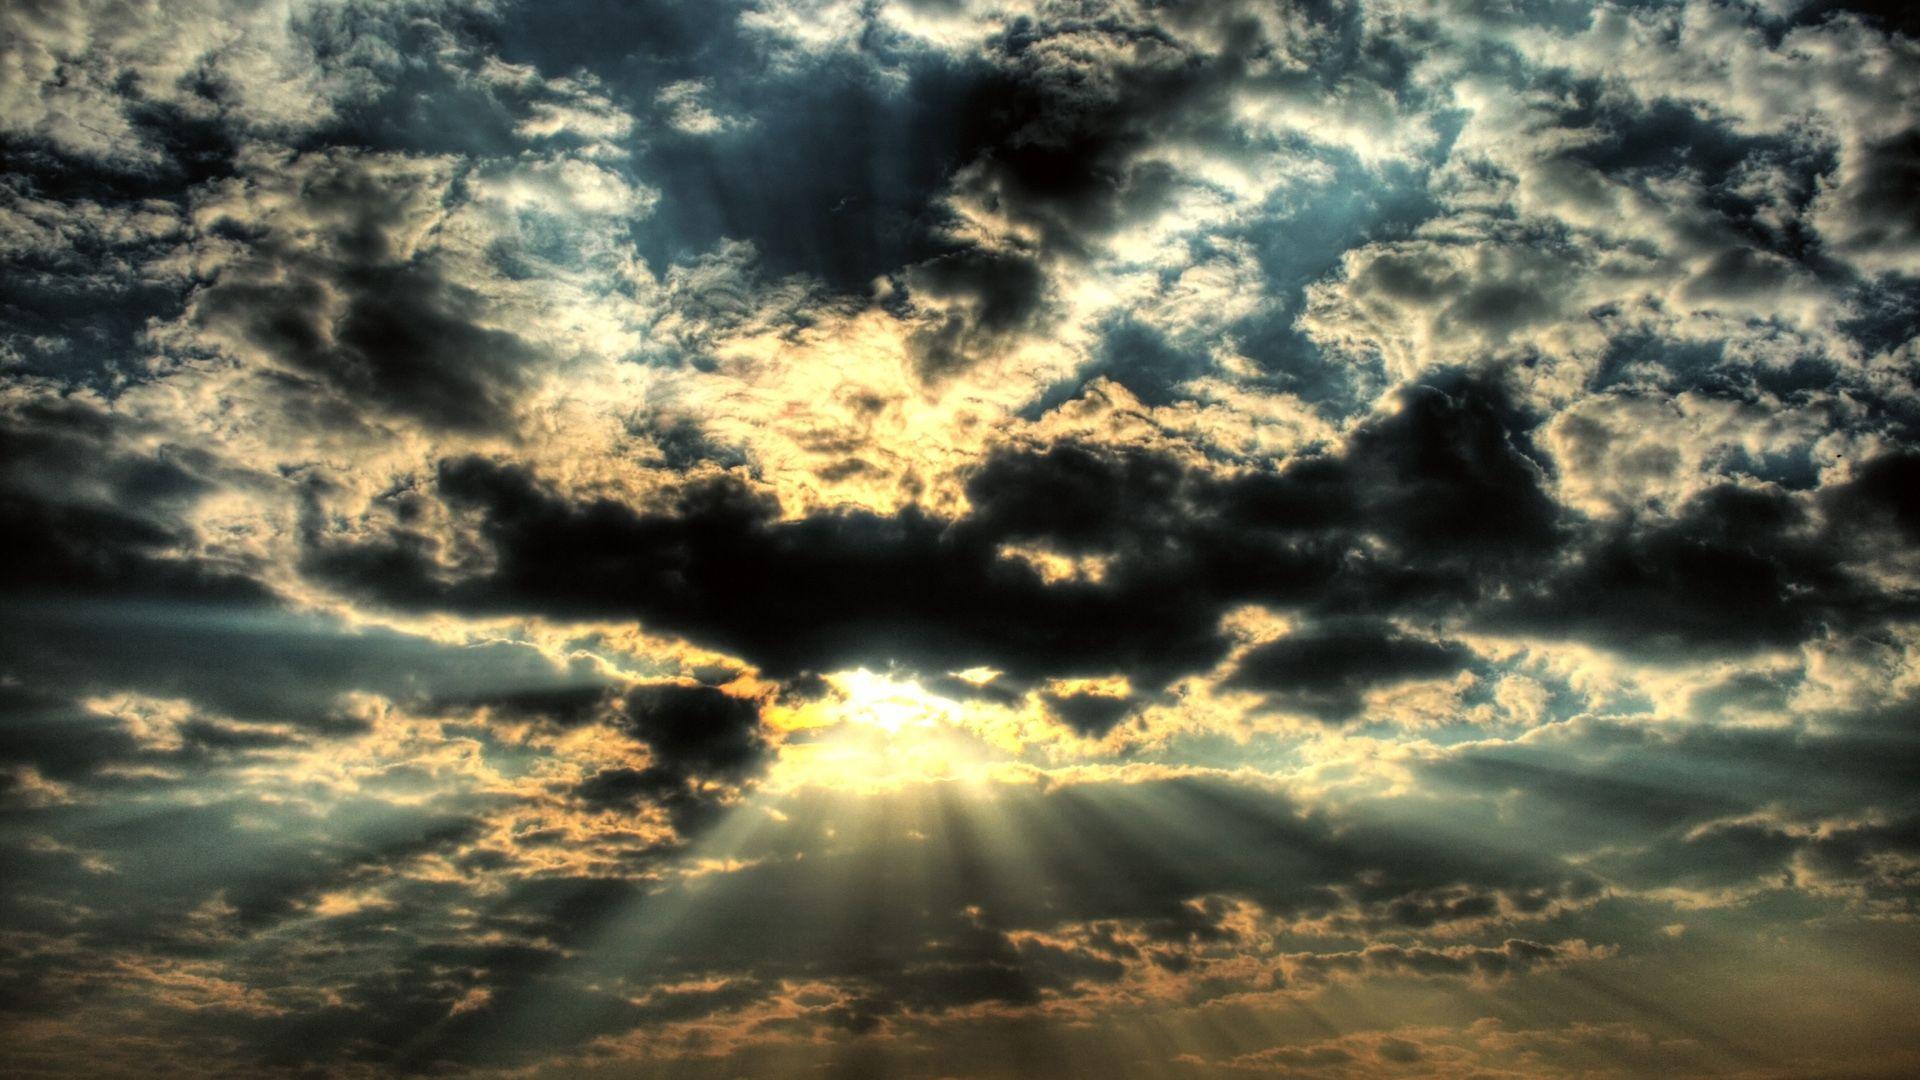 Dark Clouds picture image